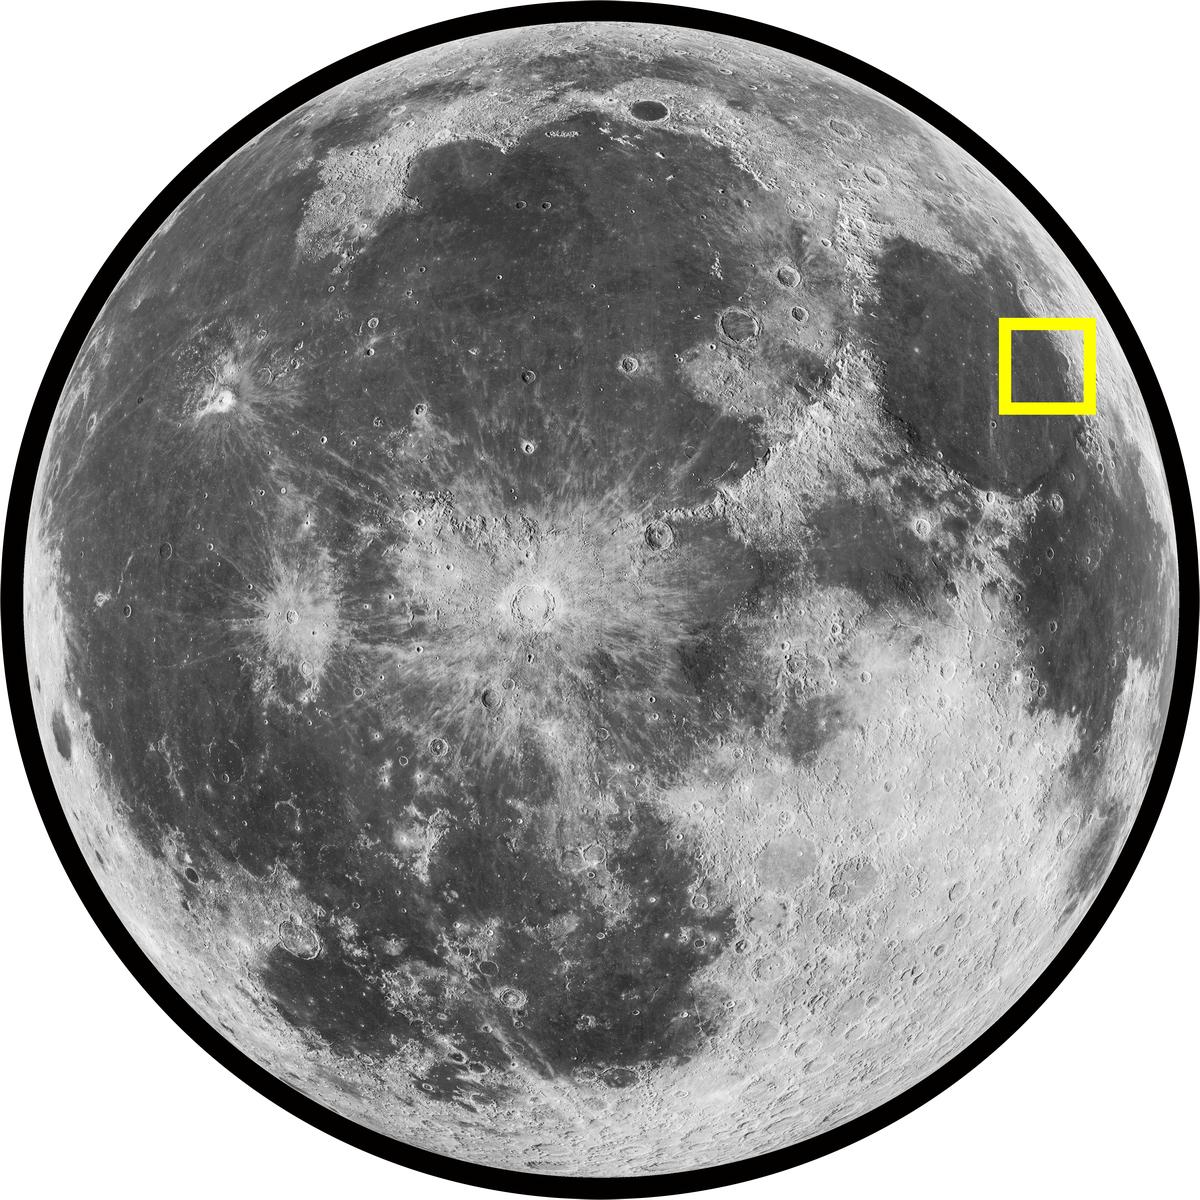 Sea of Serenity (Mare Serenitatis) on the Moon